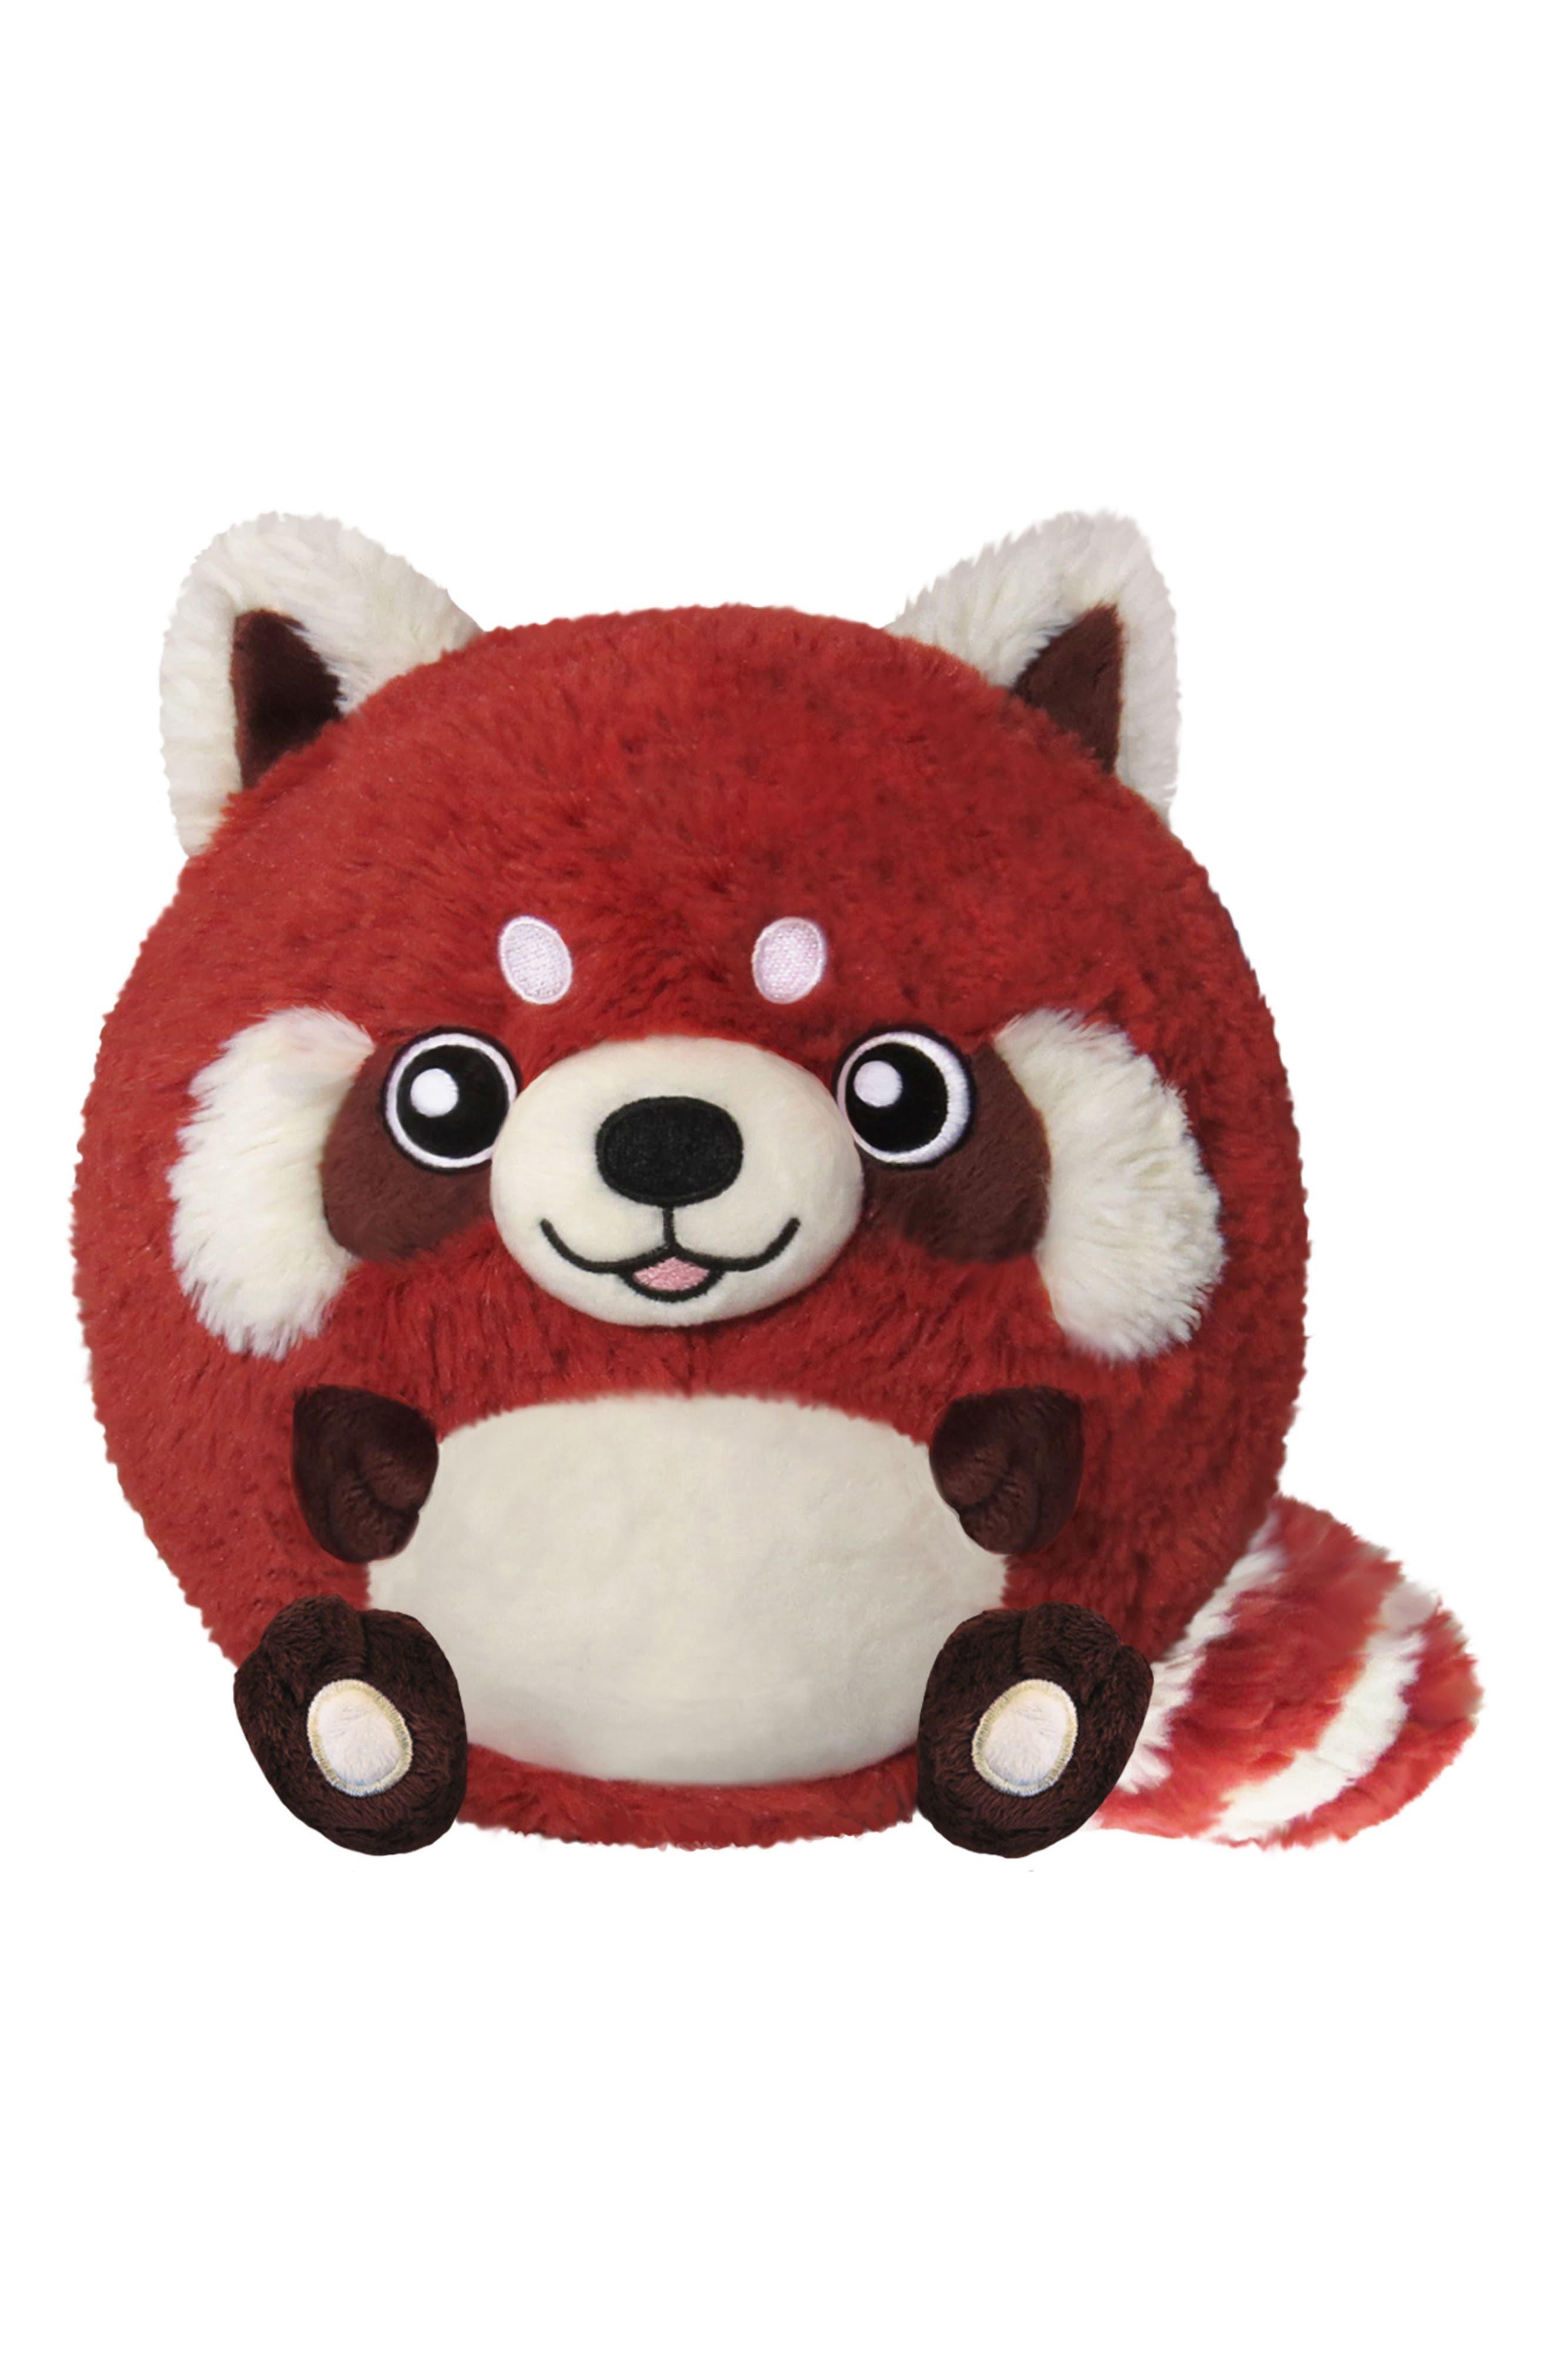 Squishable Mini Red Panda Stuffed Animal Nordstrom